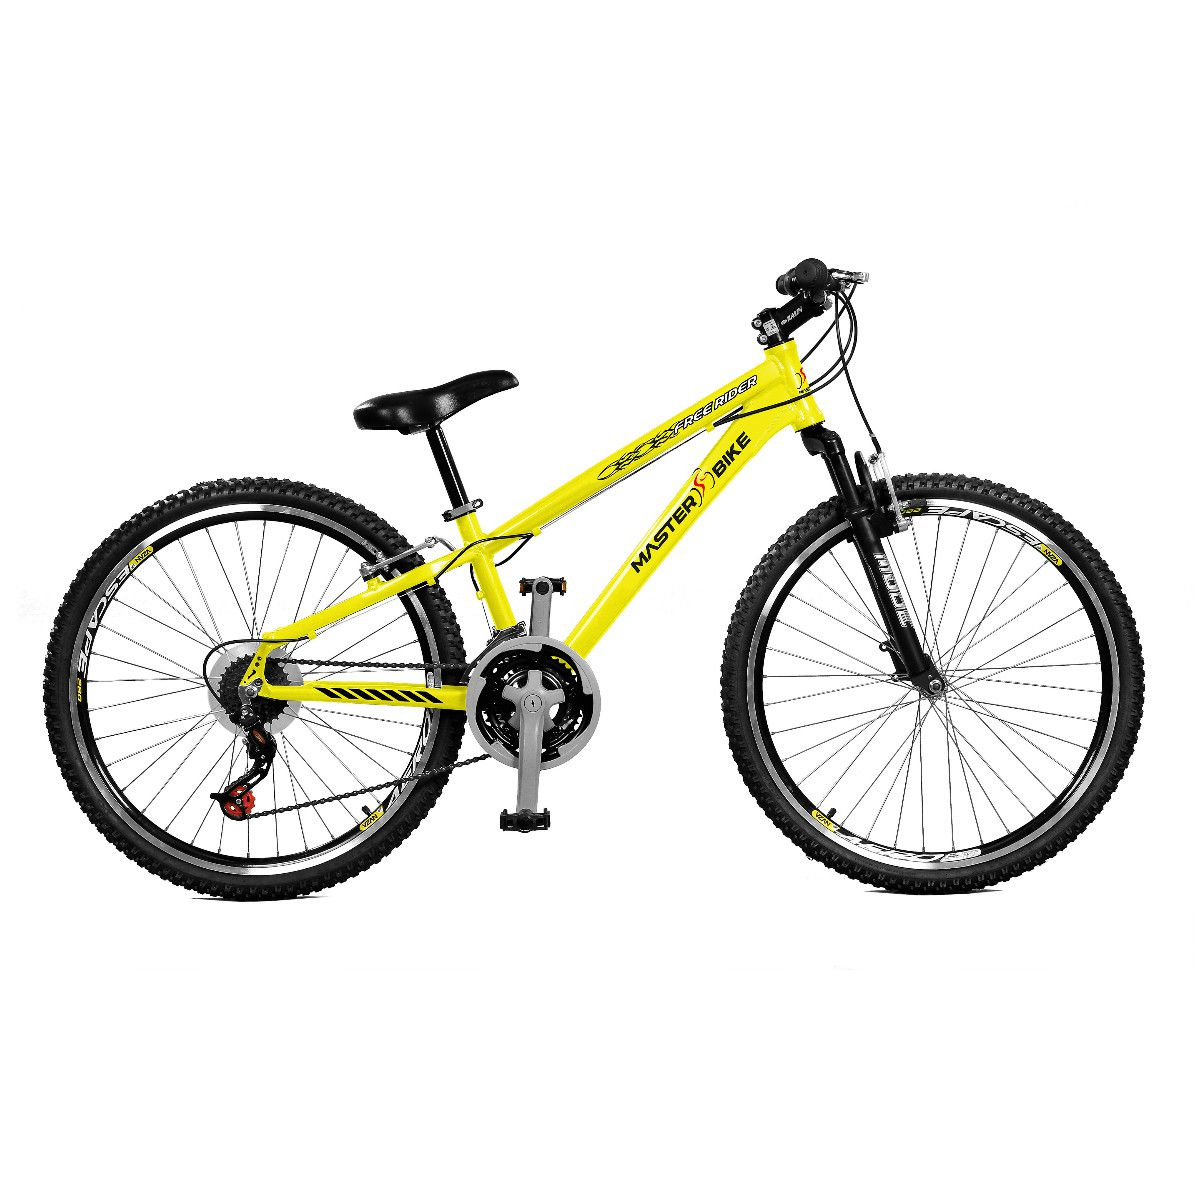 Bicicleta Master Bike Aro 26 Free Rider S A-36 21 Marchas Amarelo Neon